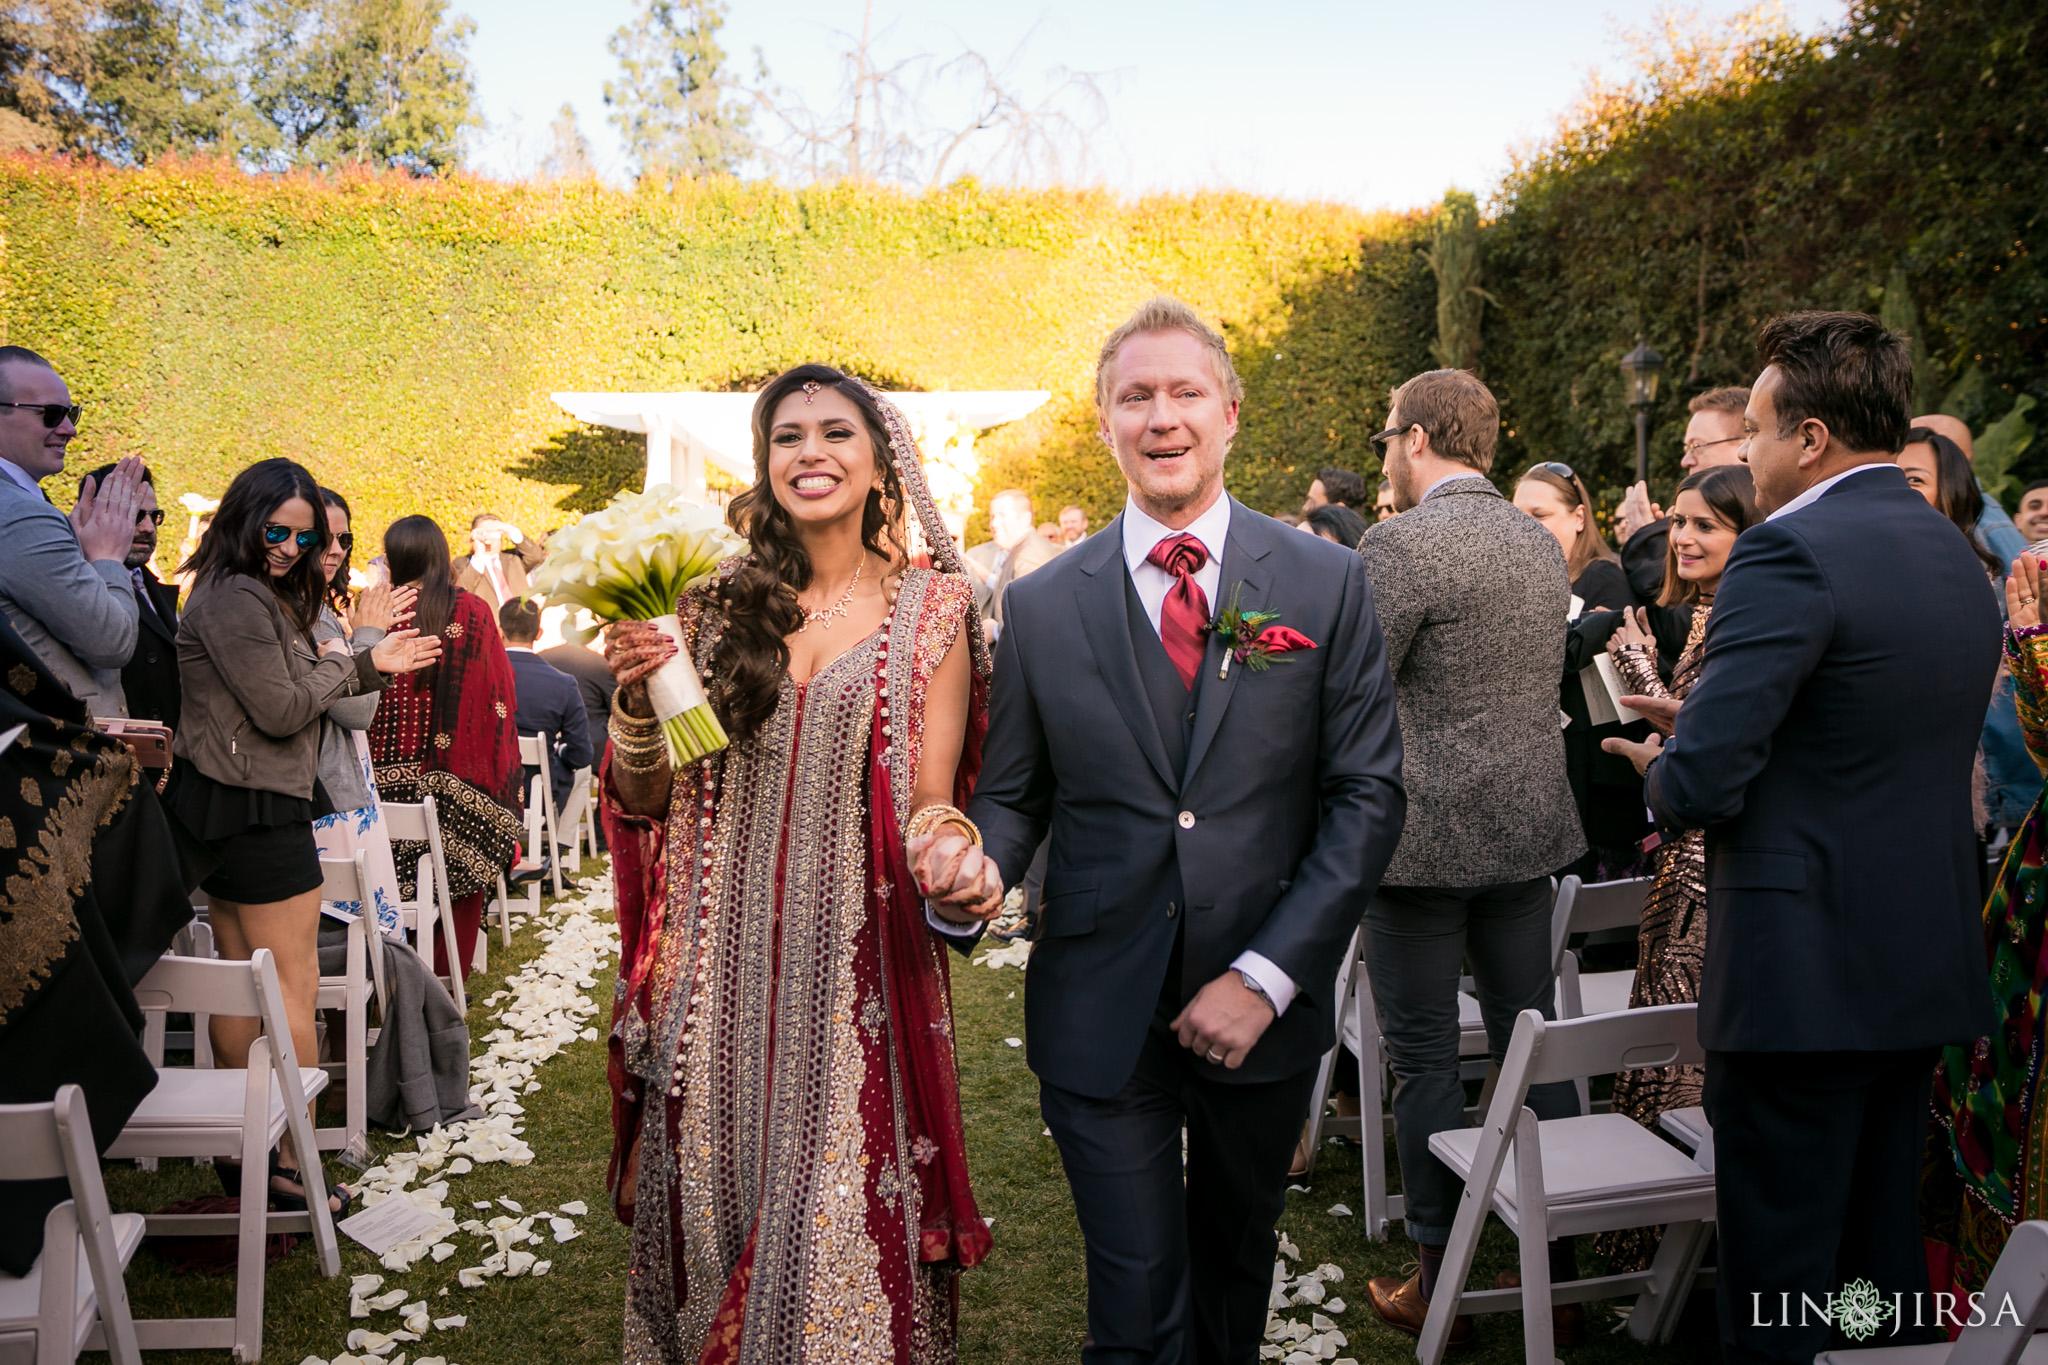 29 altadena town country club pakistani wedding ceremony photography